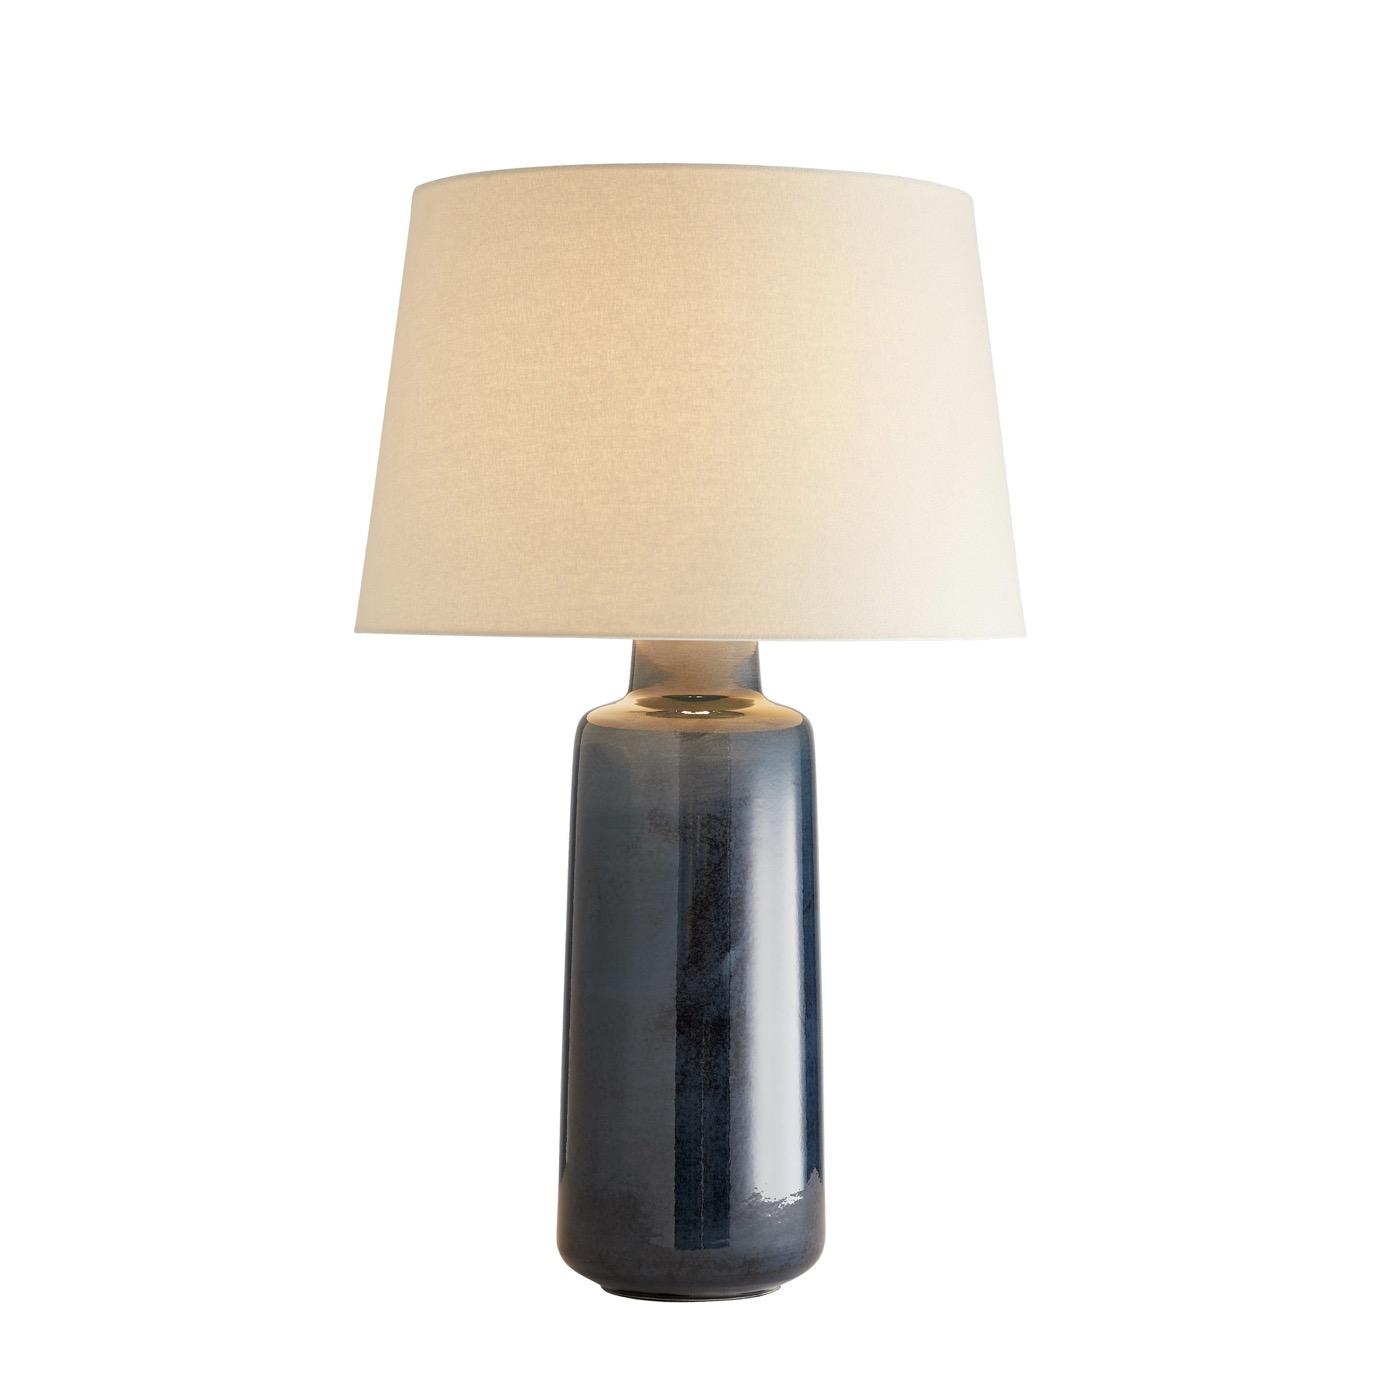 Pacifica Porcelain Table Lamp